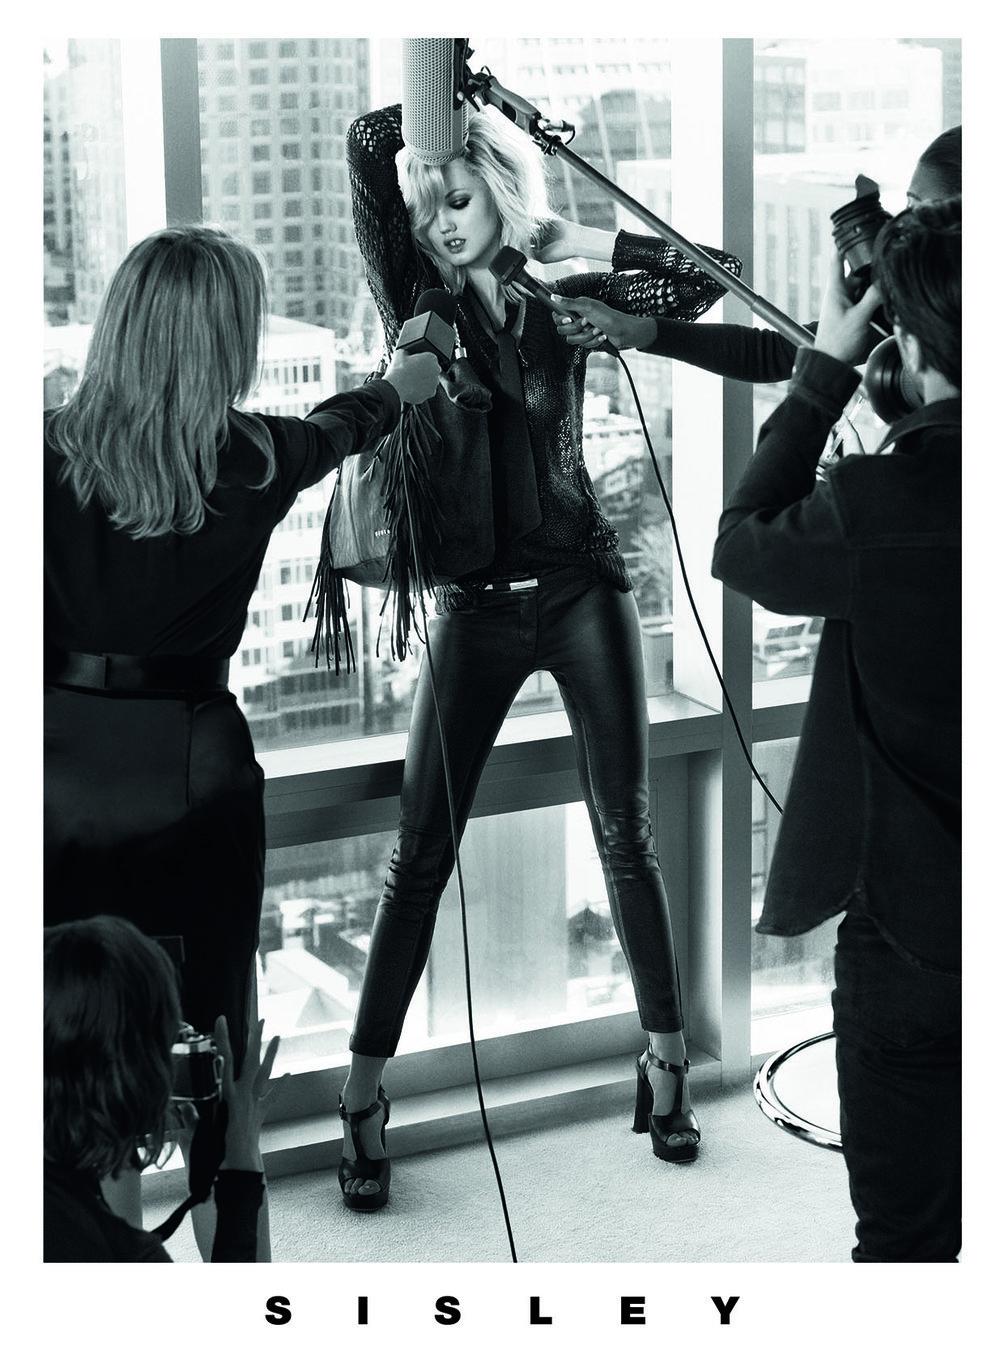 #sisley #sebastianfaena #ss14 #fashion #campaign #juliarestoinroitfeld #lindsaywixson #clementchabernaud #reubenramacher #juliavonboehm #shayashual #frankieboyd #jimkaemmerling #happymassee